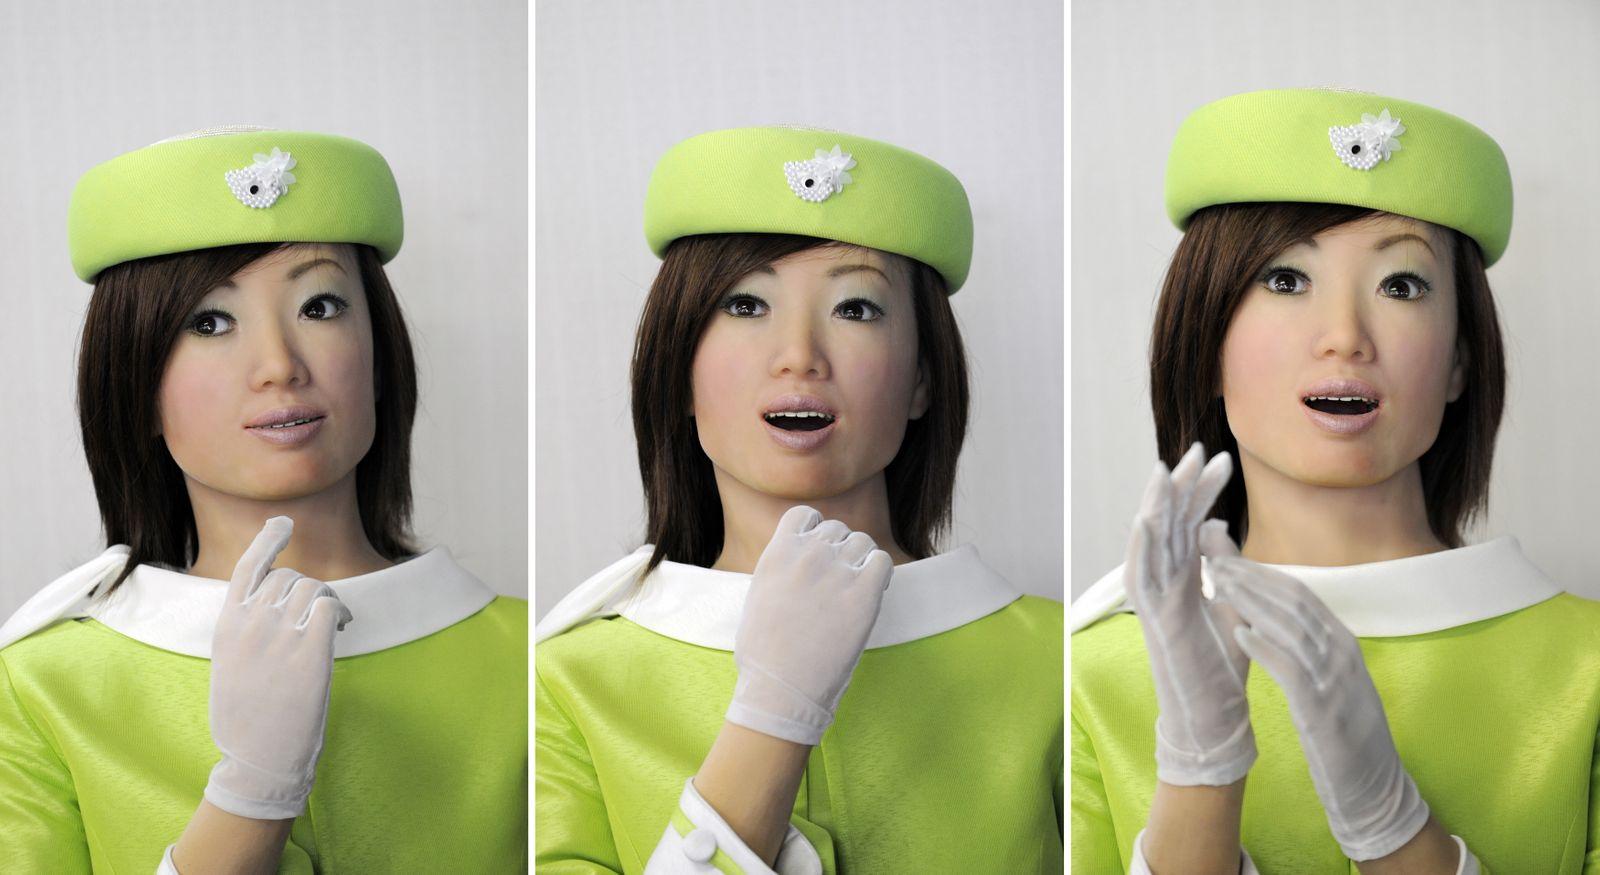 Japan / Humanoide Roboter